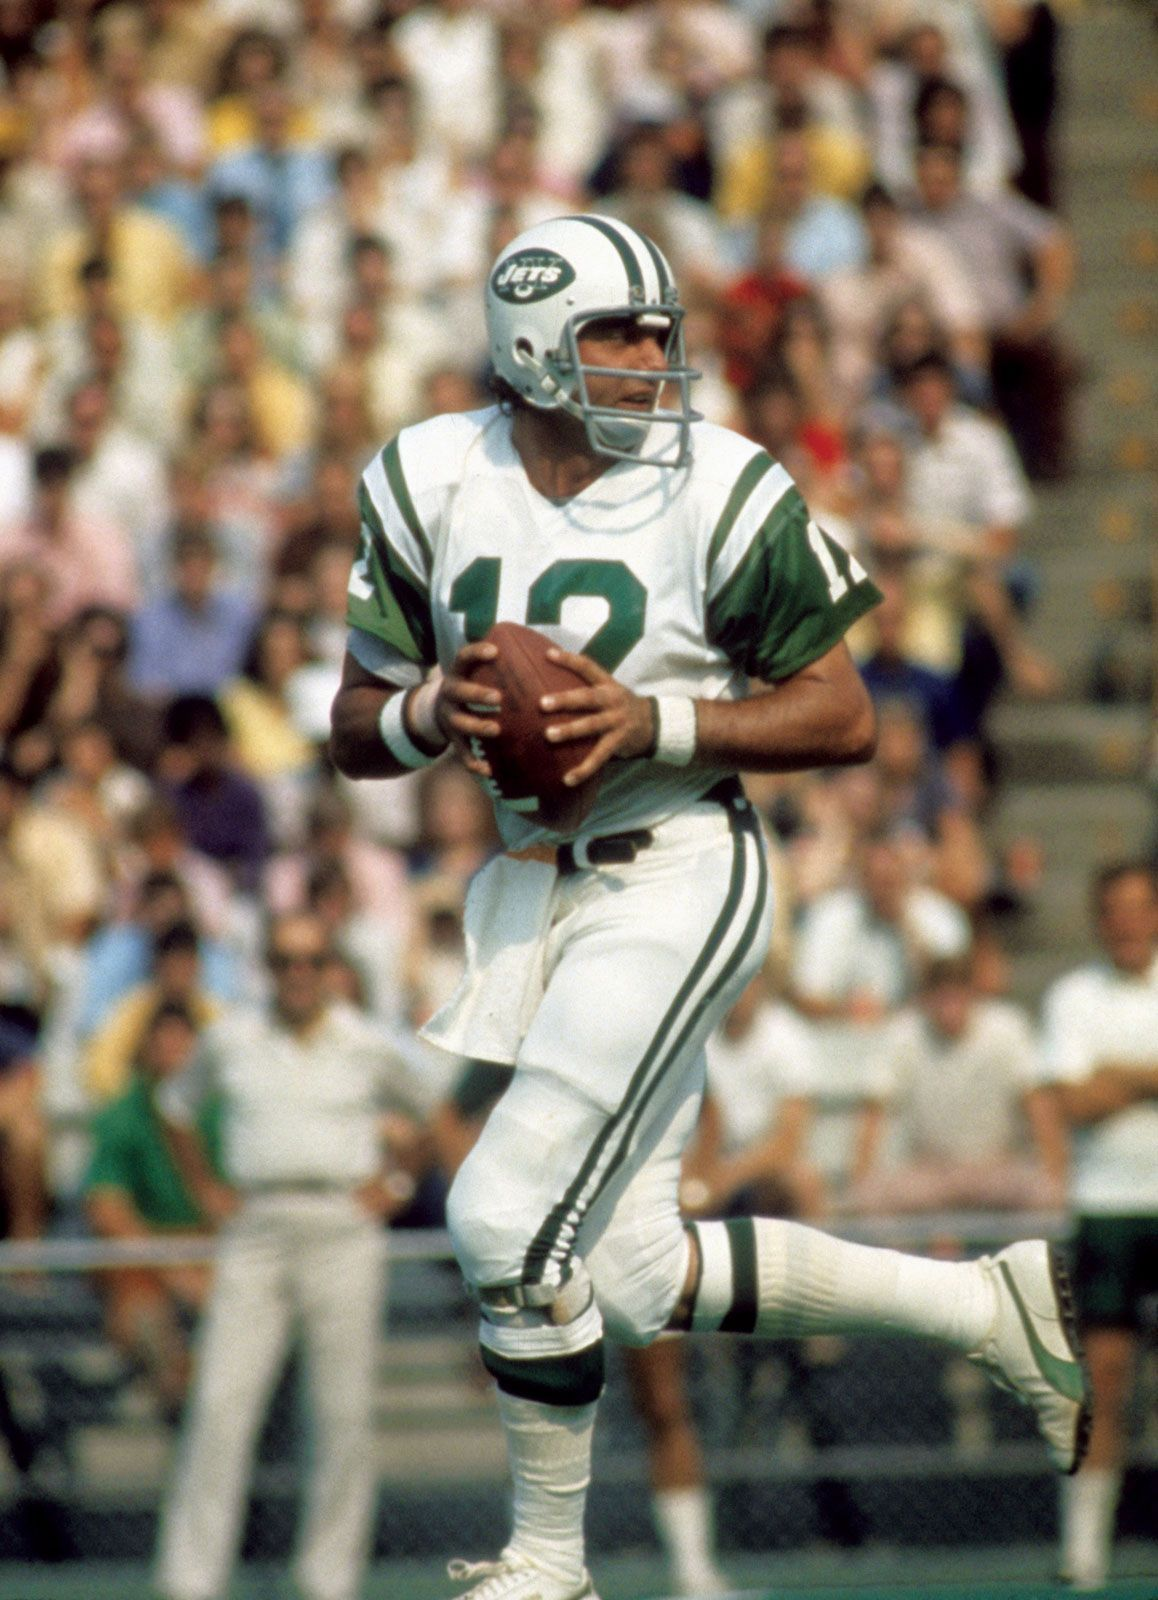 Joe Namath played 12 seasons with the New York Jets. Joe